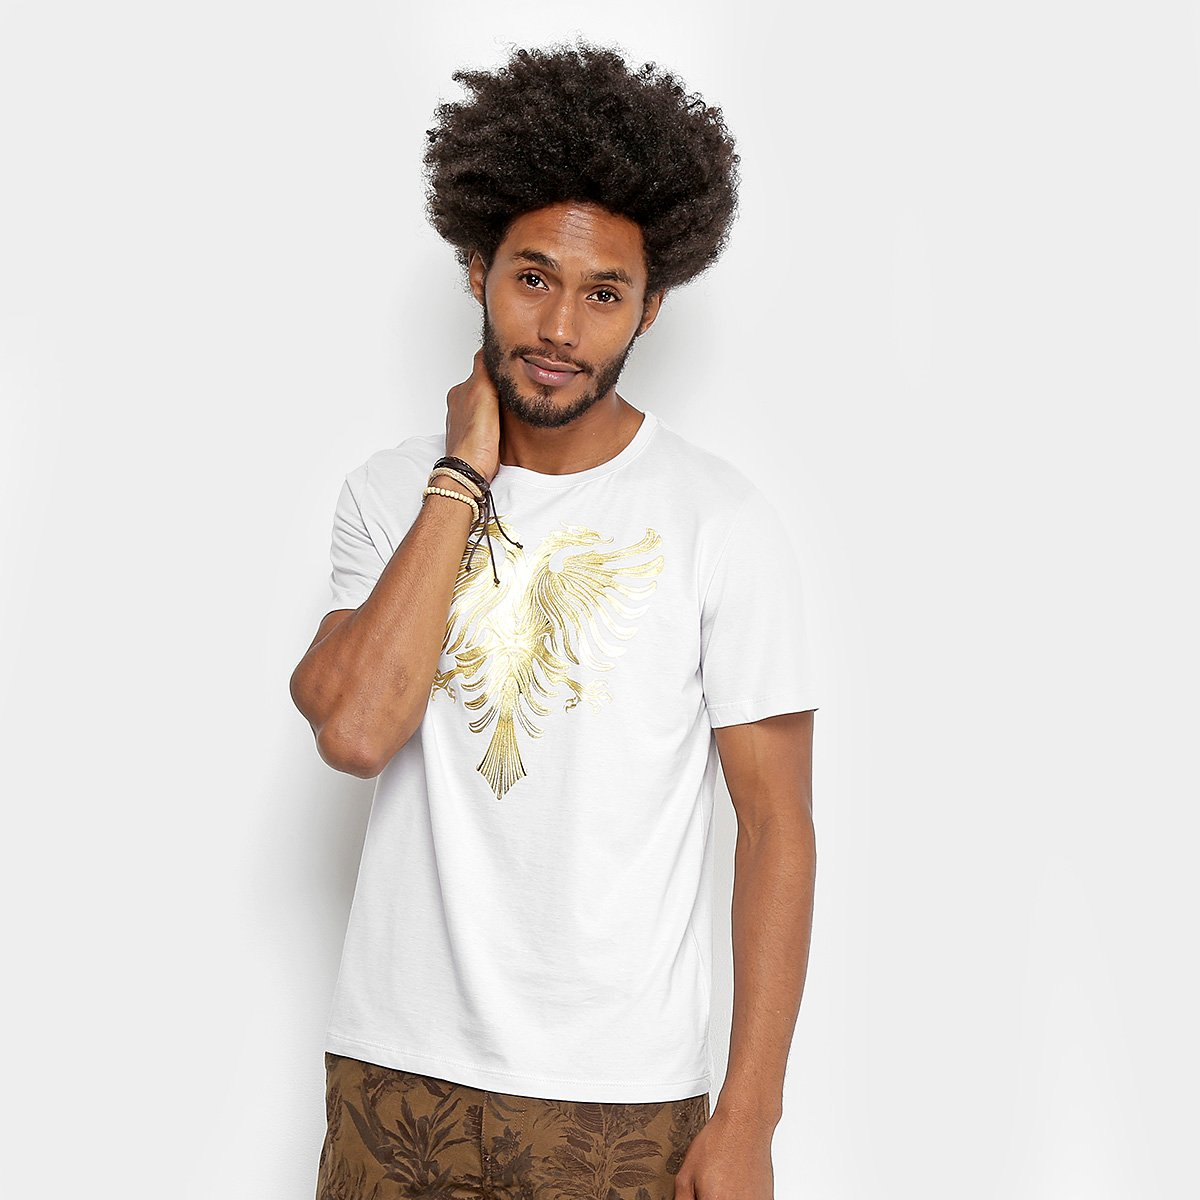 c3c0f10b1 Camiseta Cavalera Foil Relevo Águia Masculina - Compre Agora